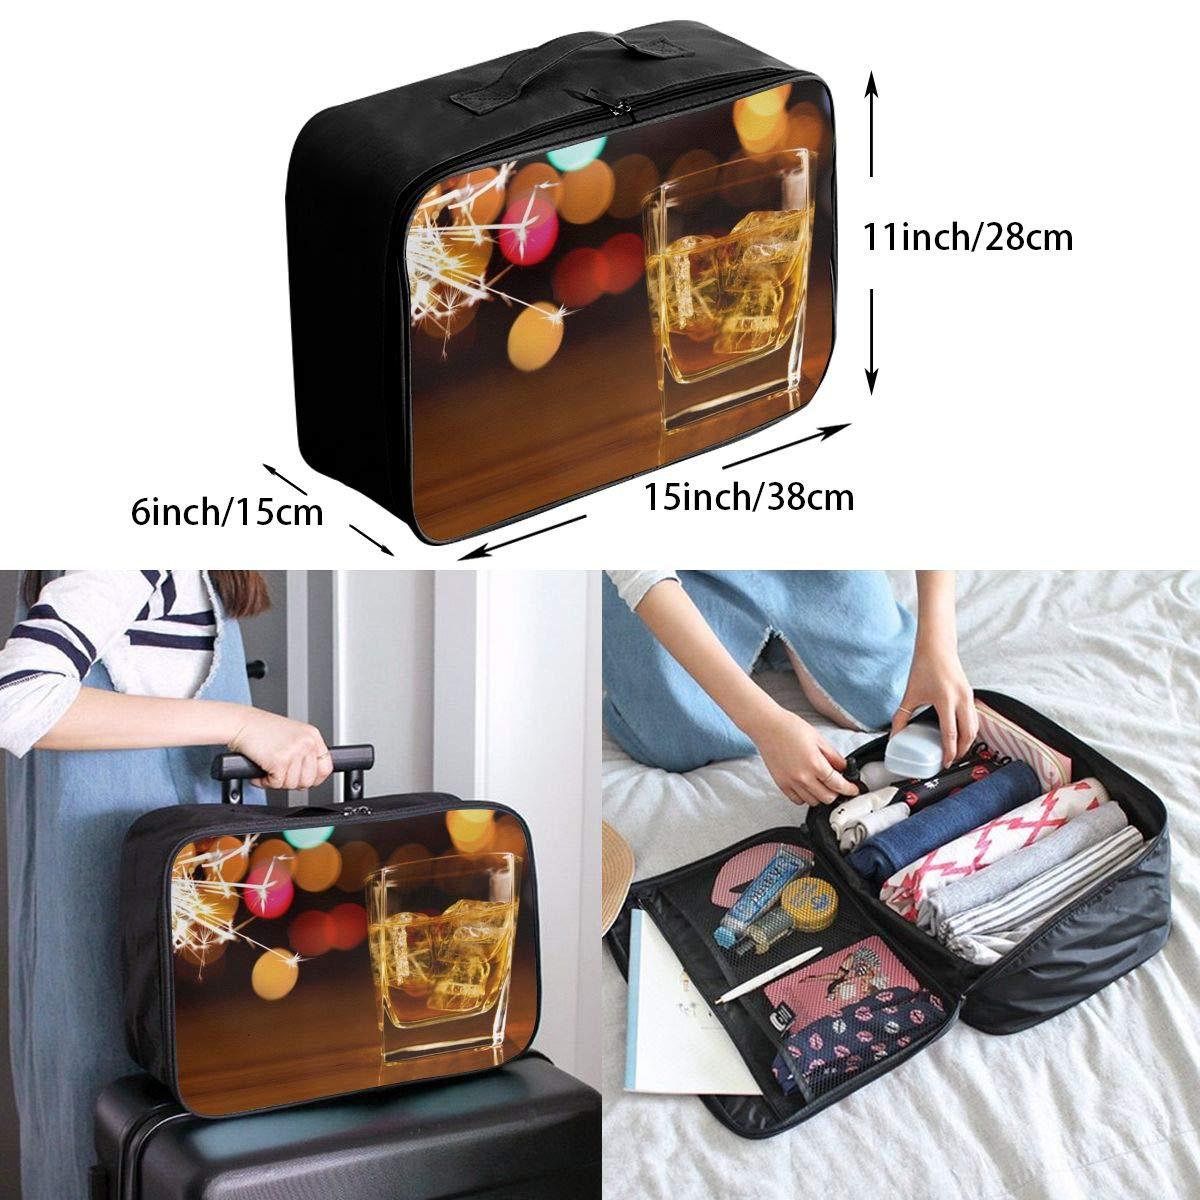 Travel Luggage Duffle Bag Lightweight Portable Handbag Whisky Glass Large Capacity Waterproof Foldable Storage Tote